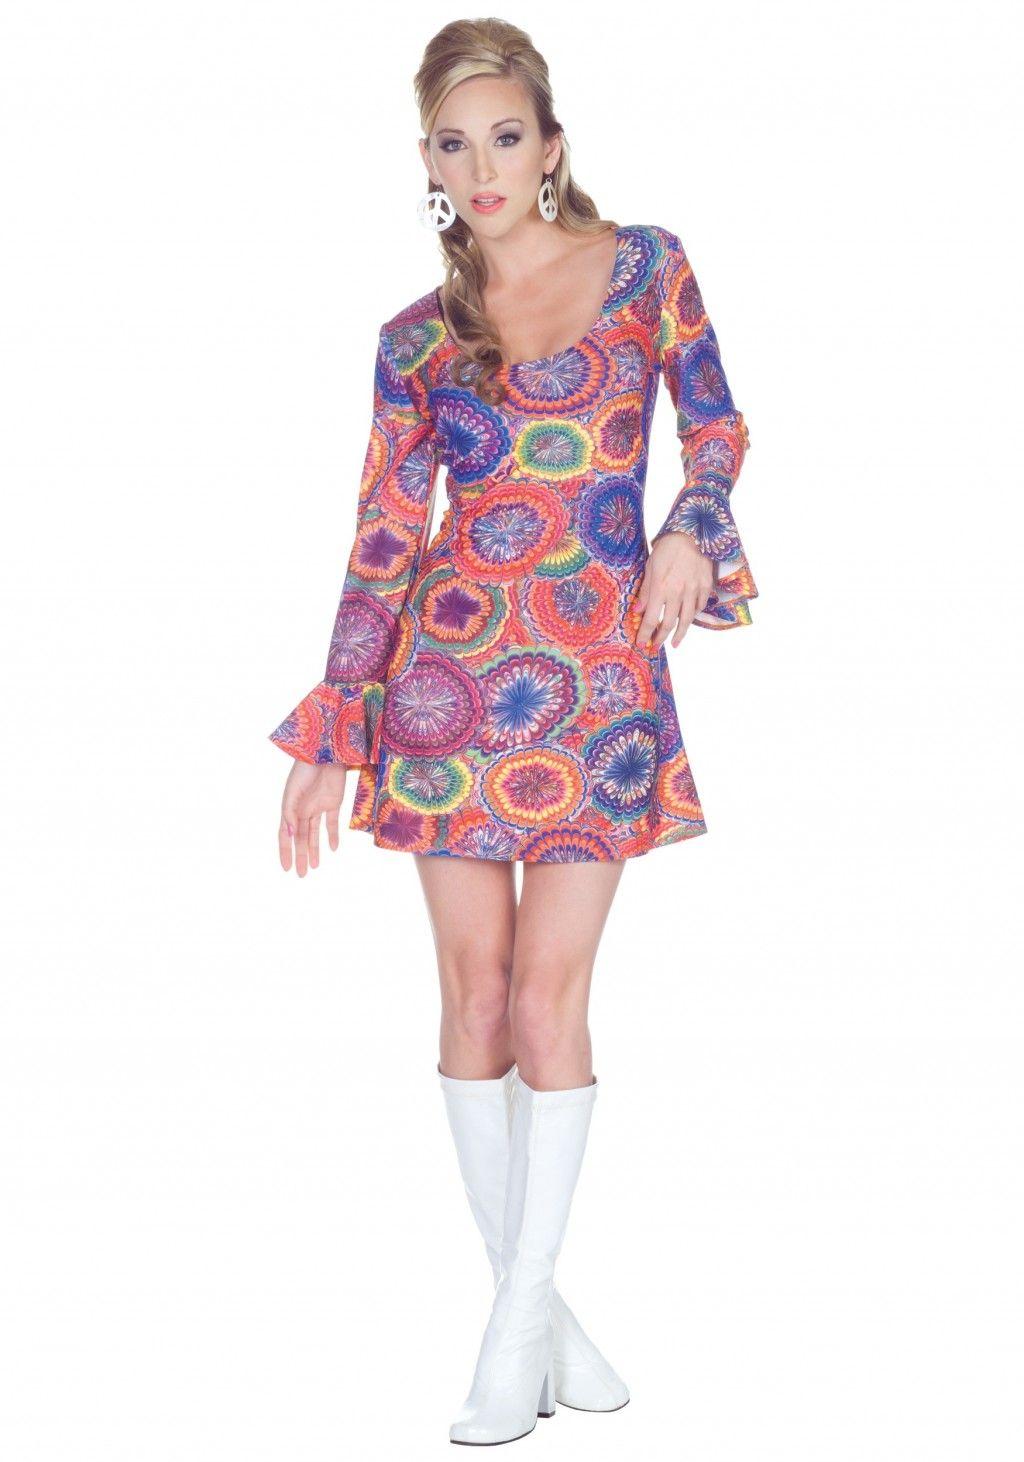 Party Dresses for Tweens Australia Image Girls fashion